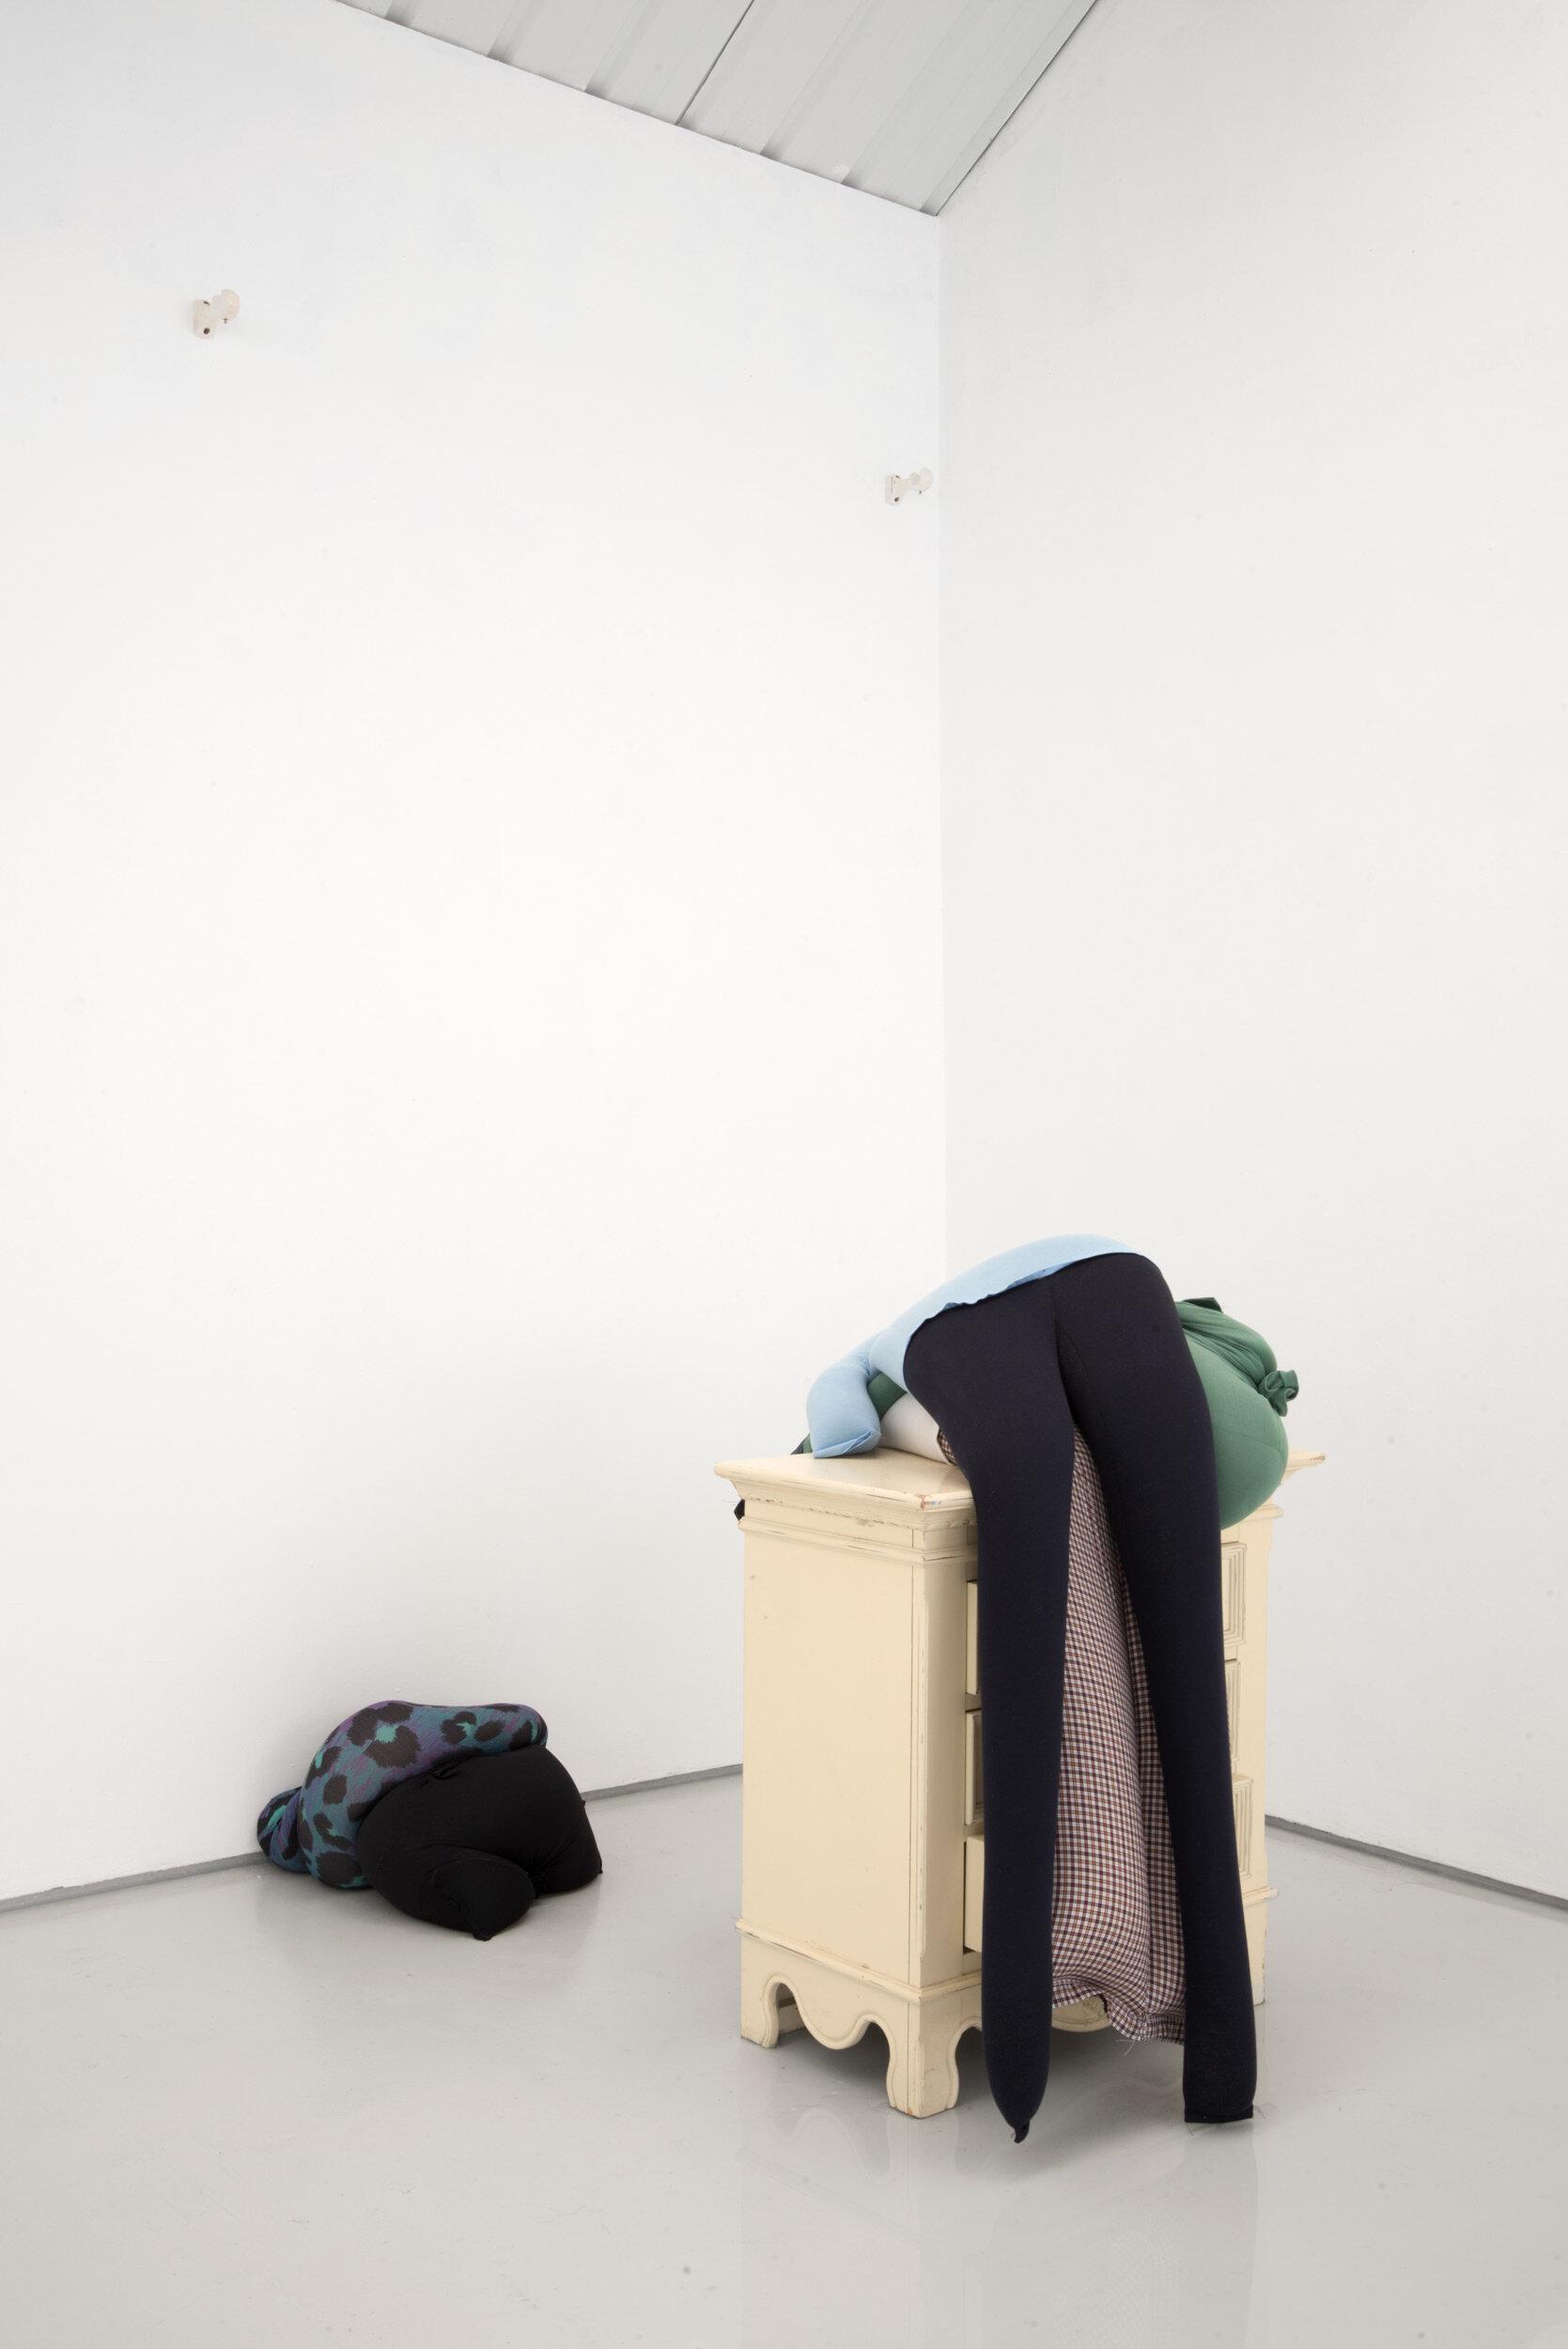 Fall, slump, drop on a bedside cabinet in water[...], Installation View, Alex Farrar, Bloc Projects, 2019, 7.jpg